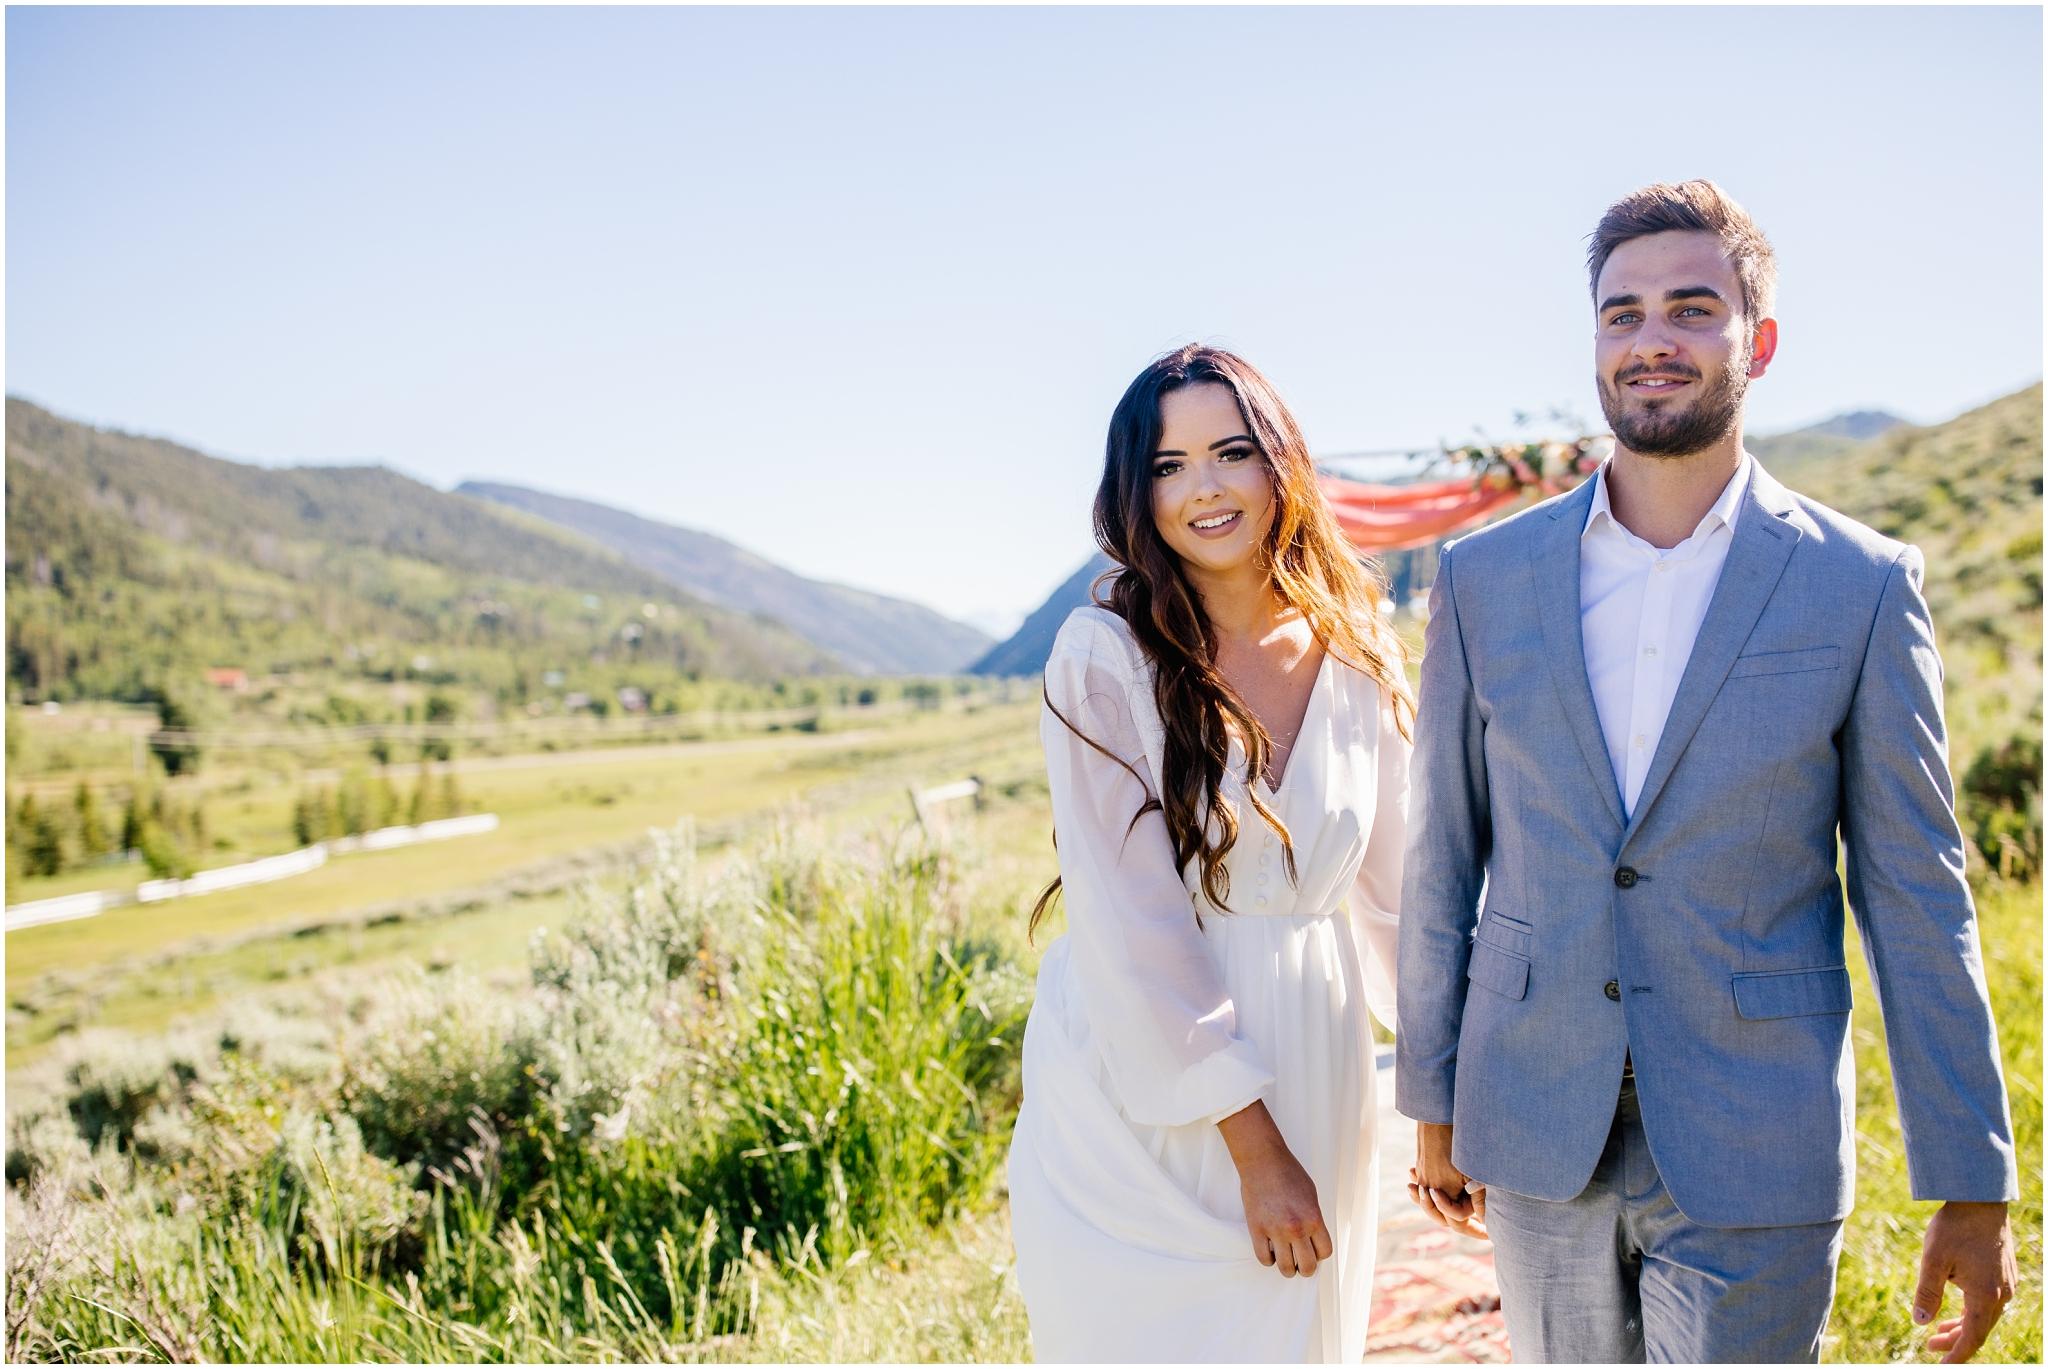 MountainShoot-50_Lizzie-B-Imagery-Utah-Wedding-Photographer-Salt-Lake-City-Park-City-Utah-County.jpg